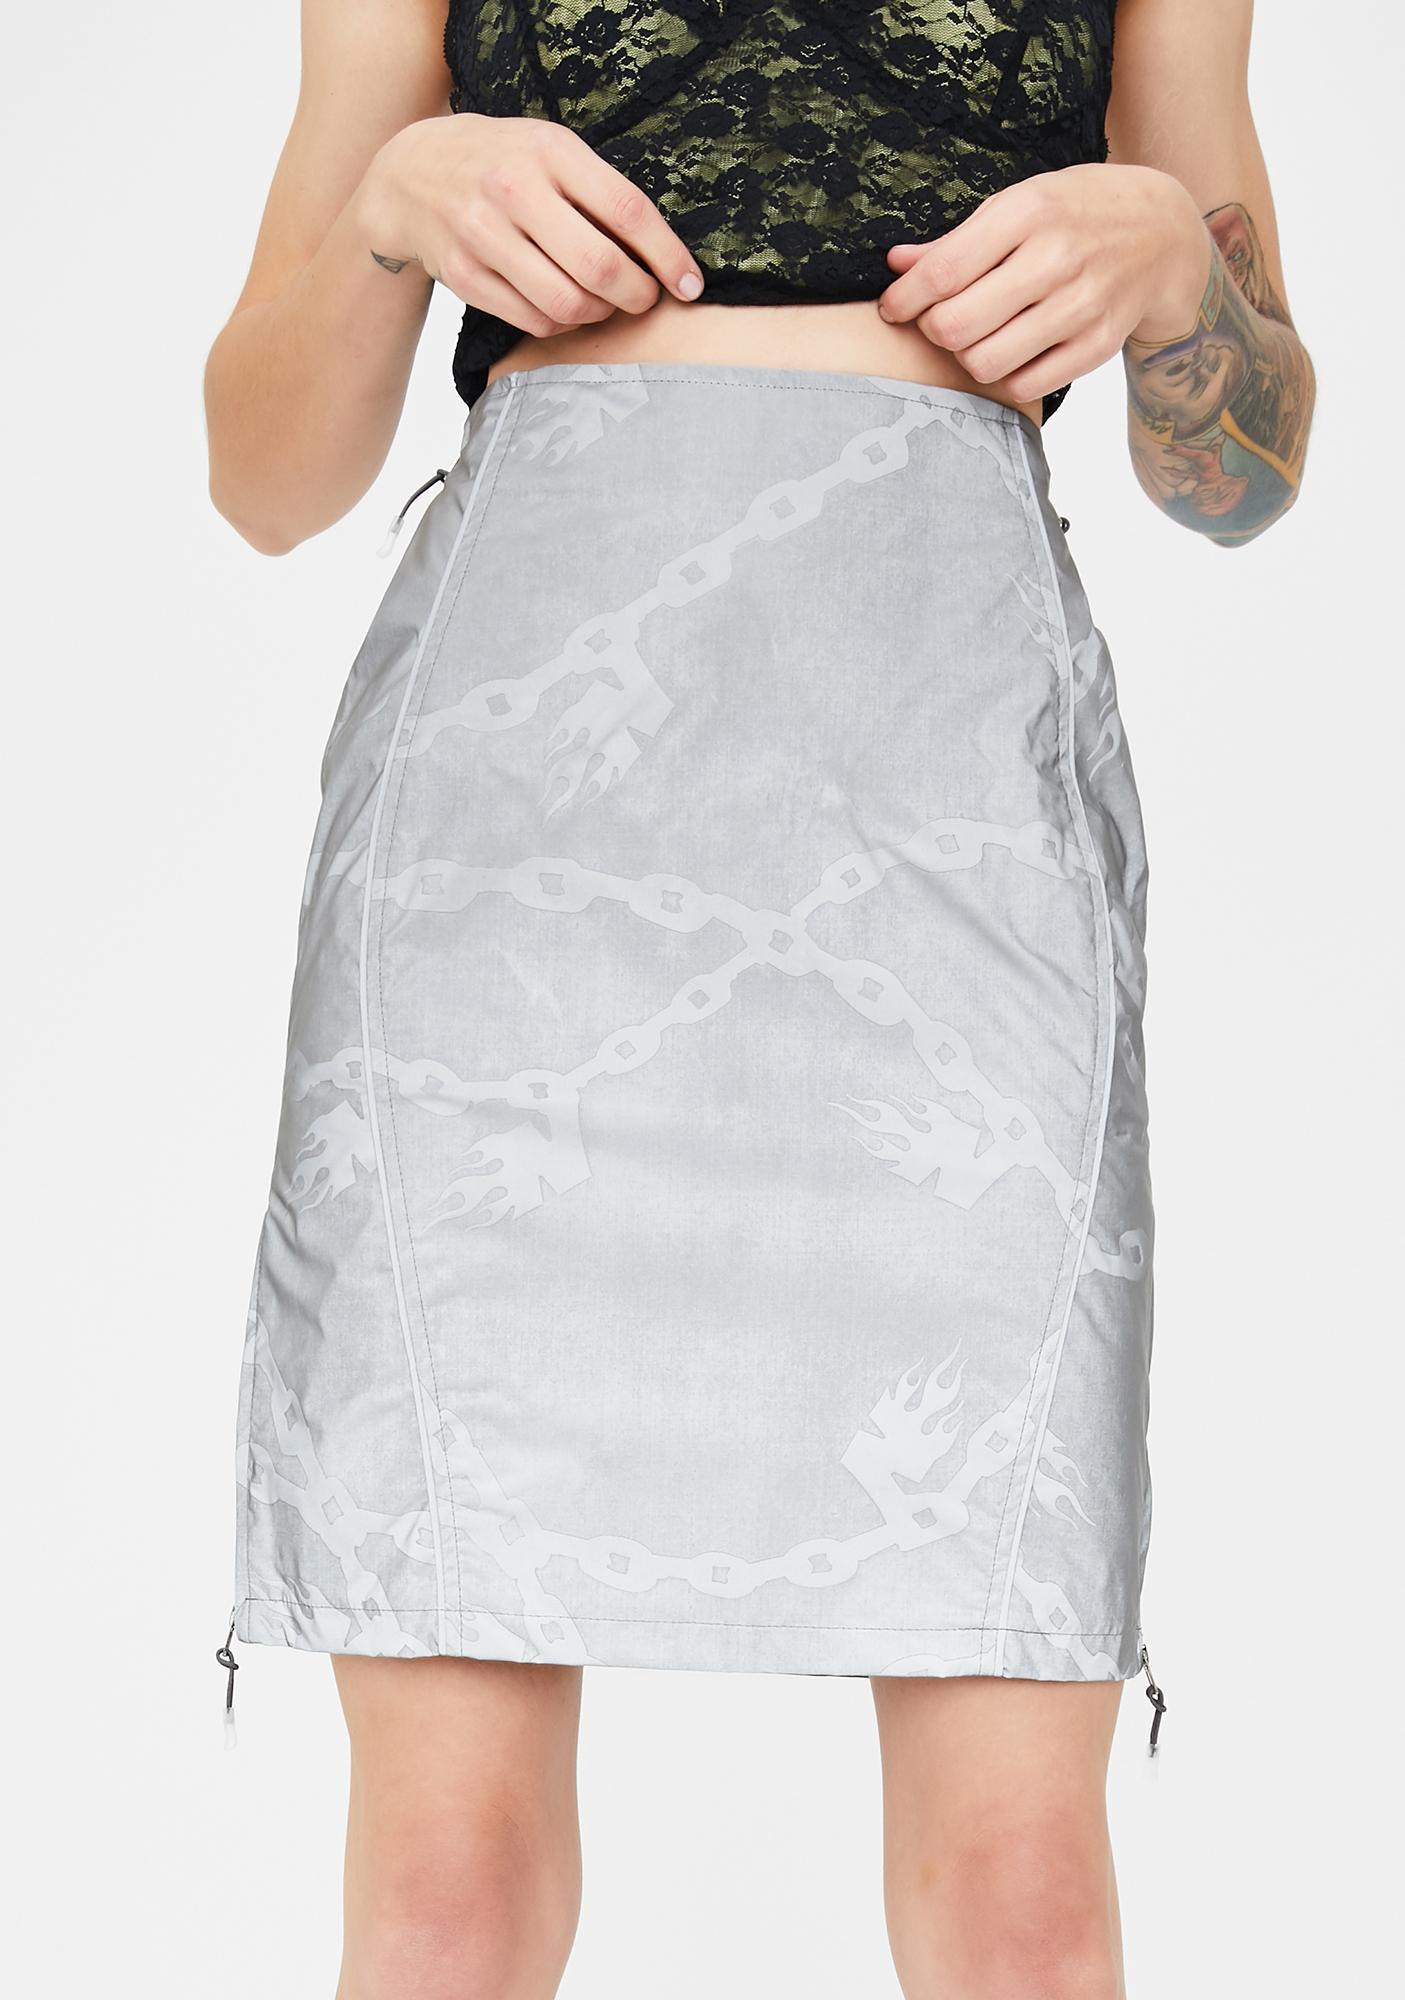 No Dress Reflective Chain Print Skirt